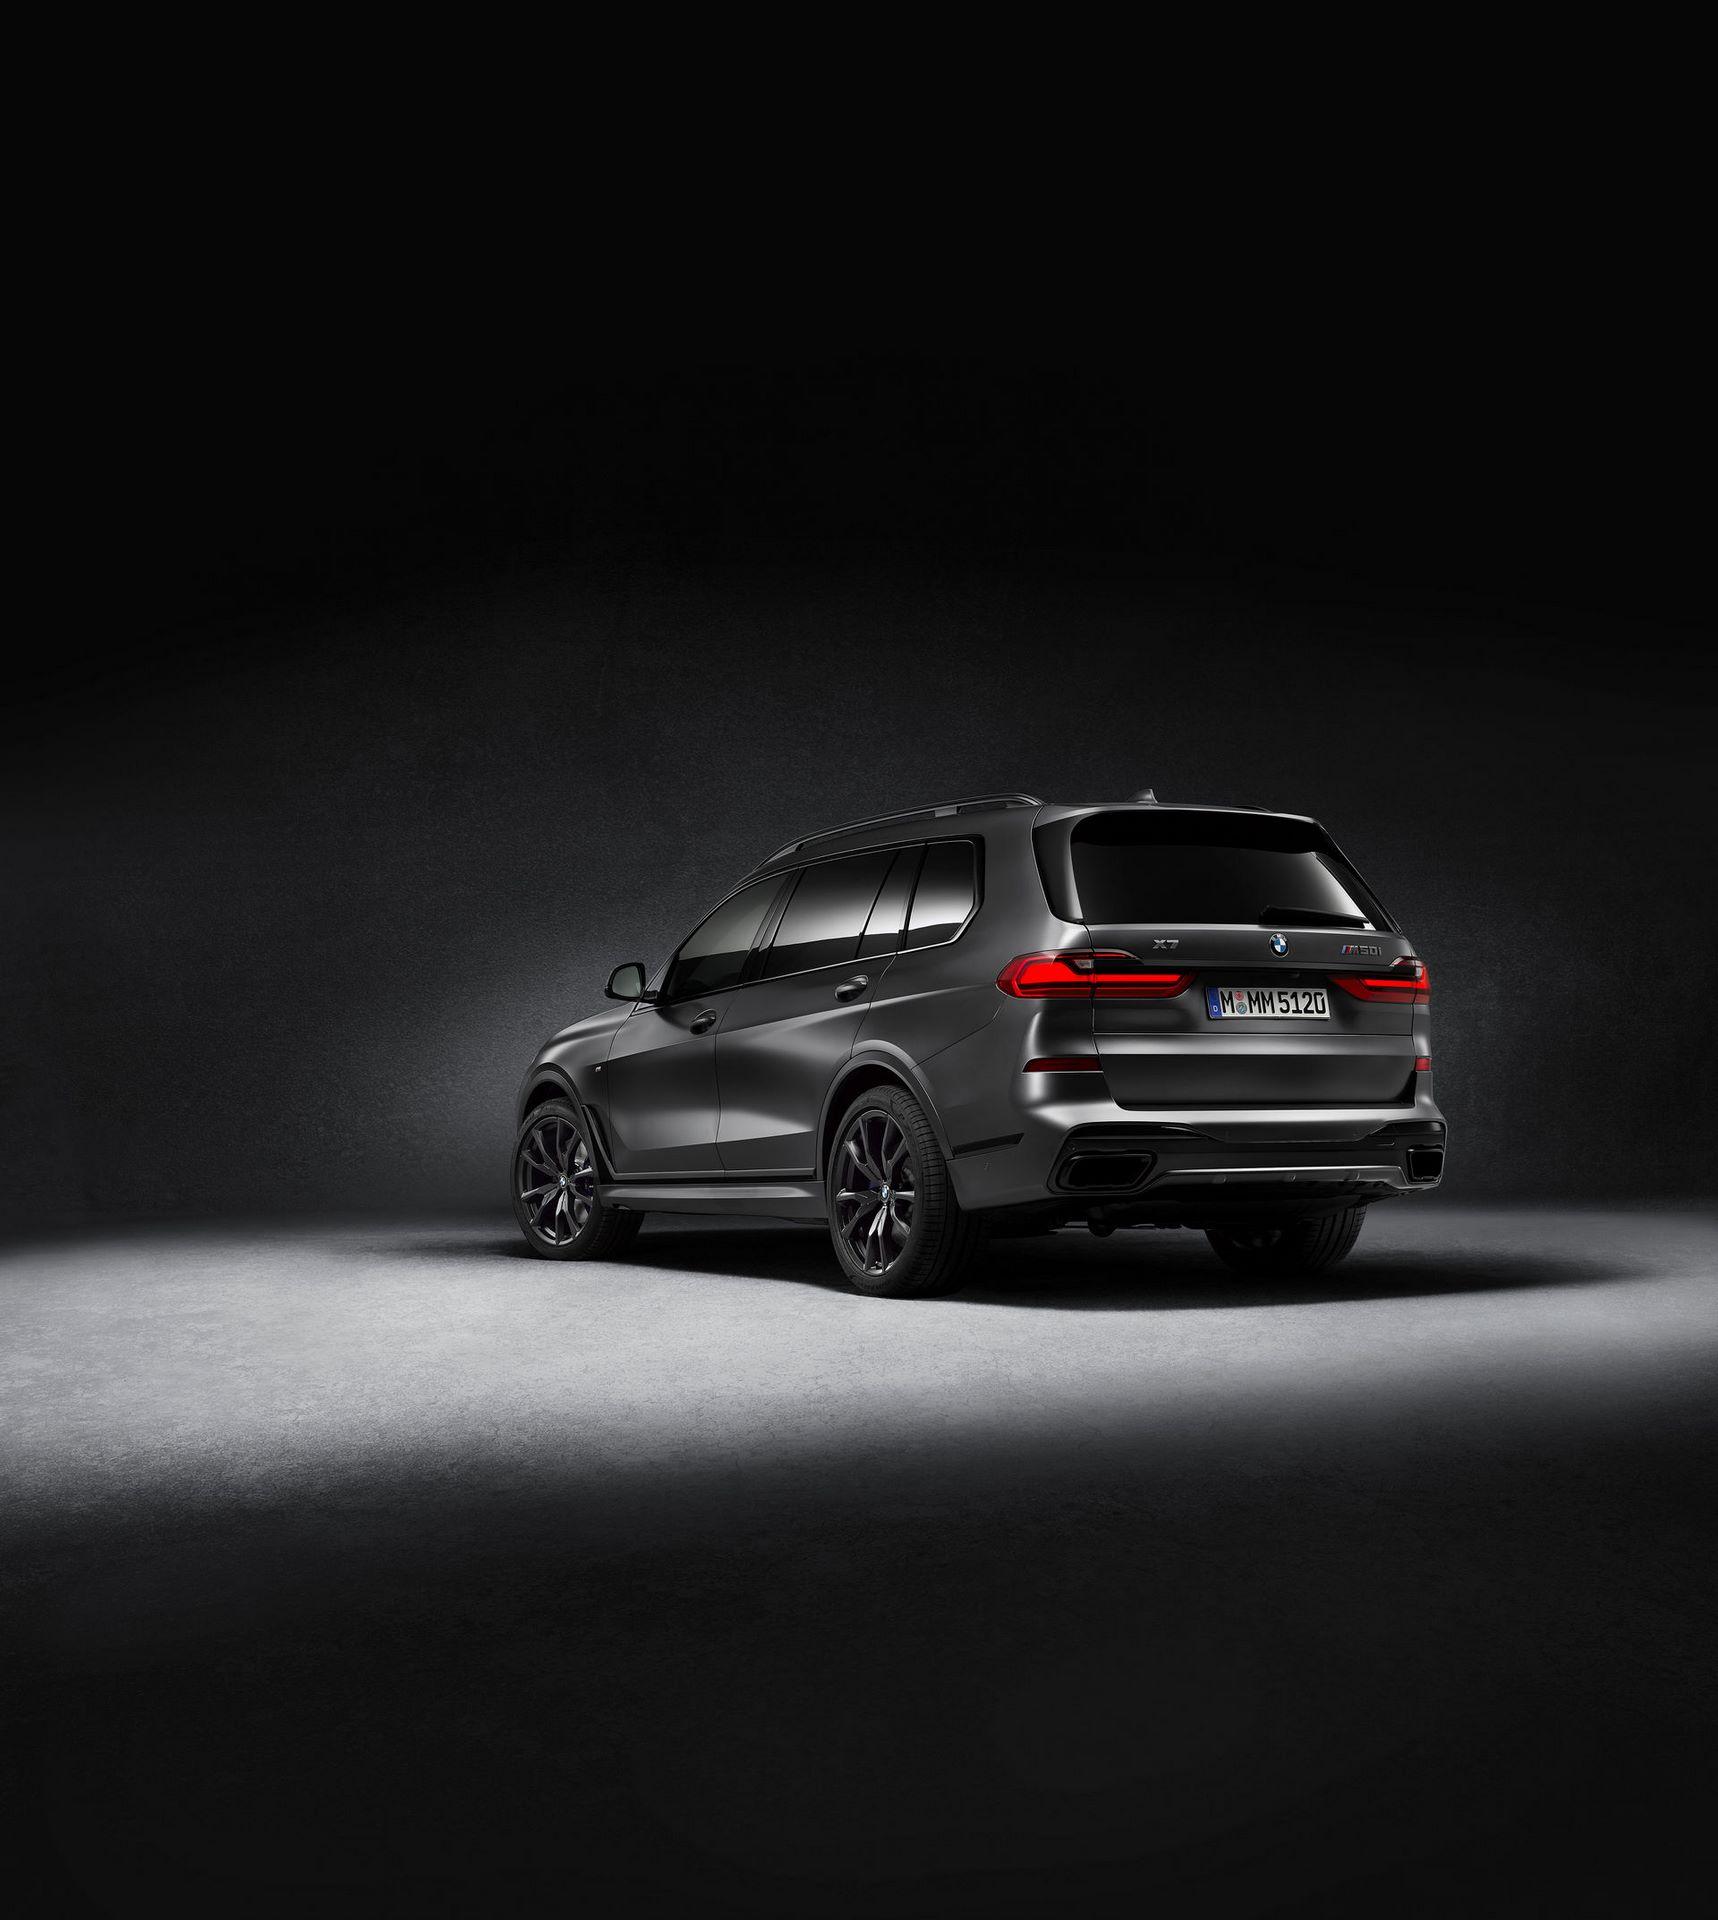 BMW-X7-Dark-Shadow-Edition-9